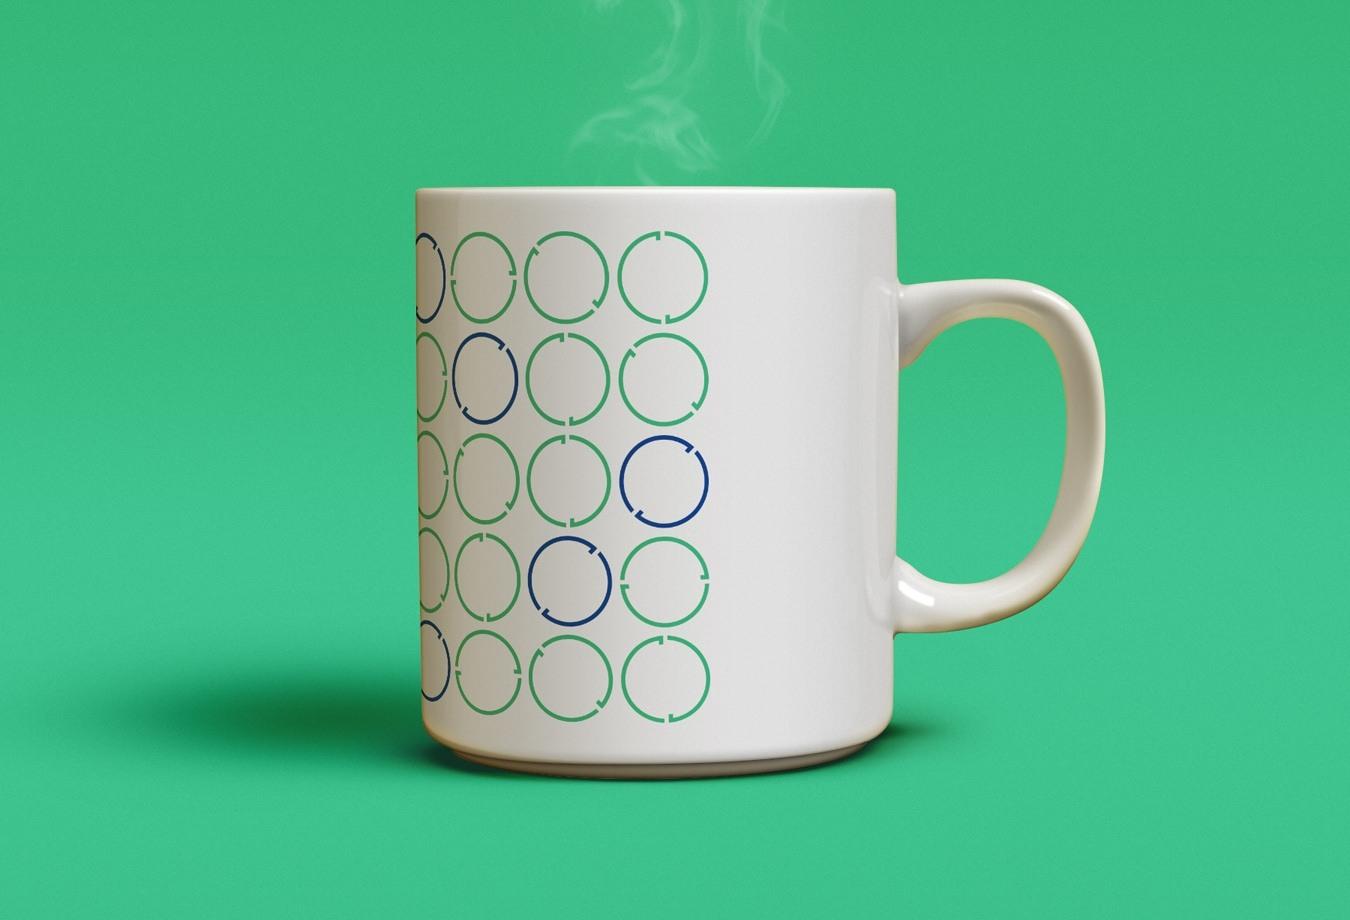 rotazi-identity-07-mug